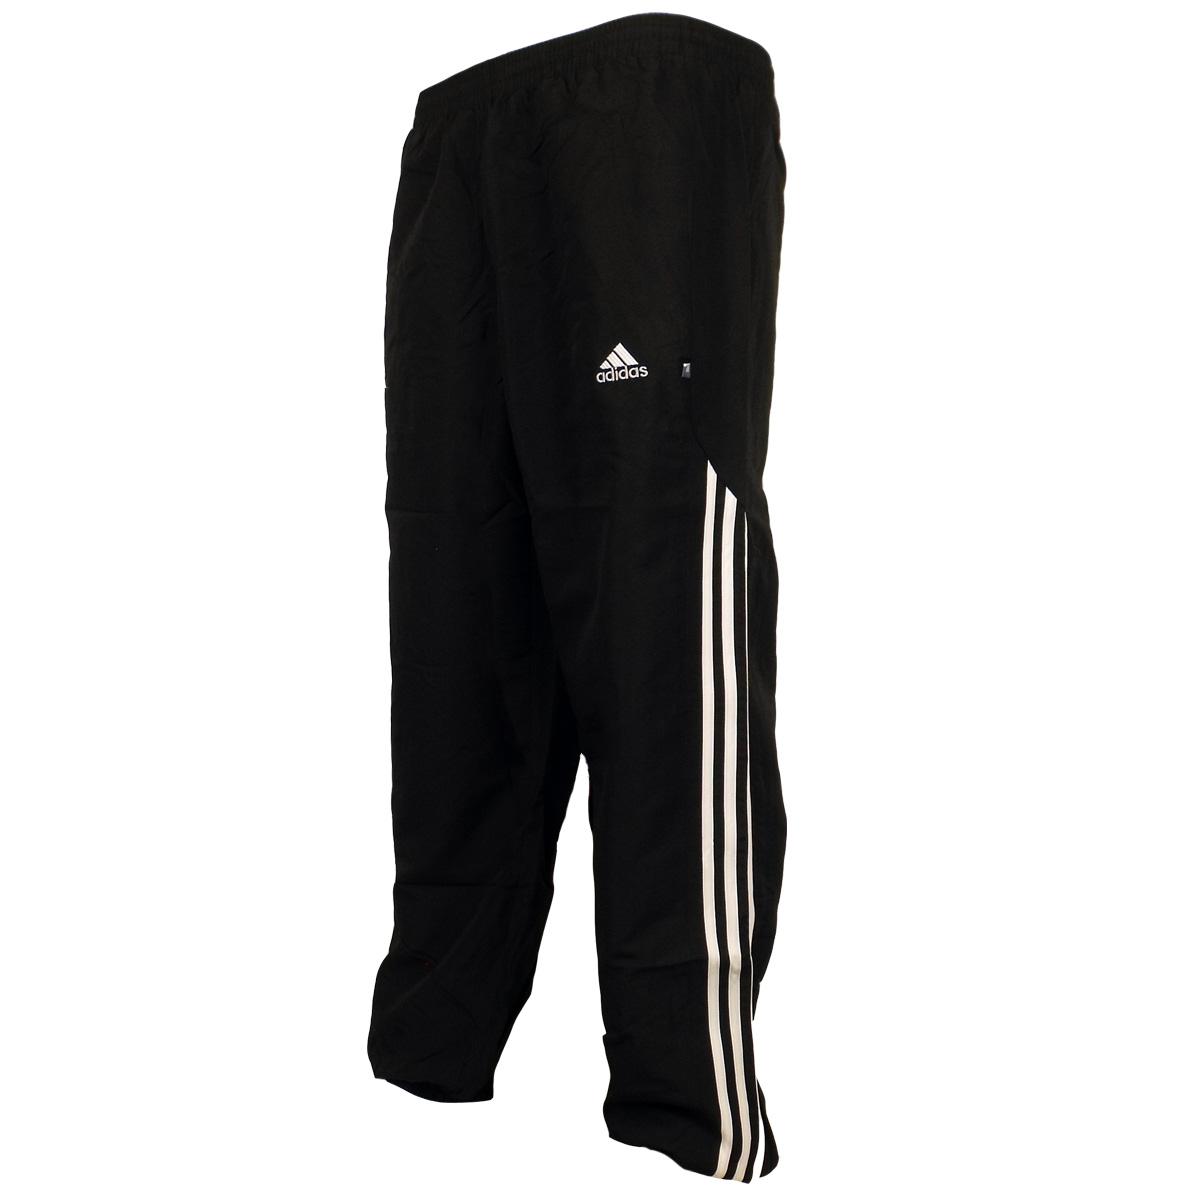 Mens Adidas 3 Stripe Cuffed Stinger Track Pant Bottoms